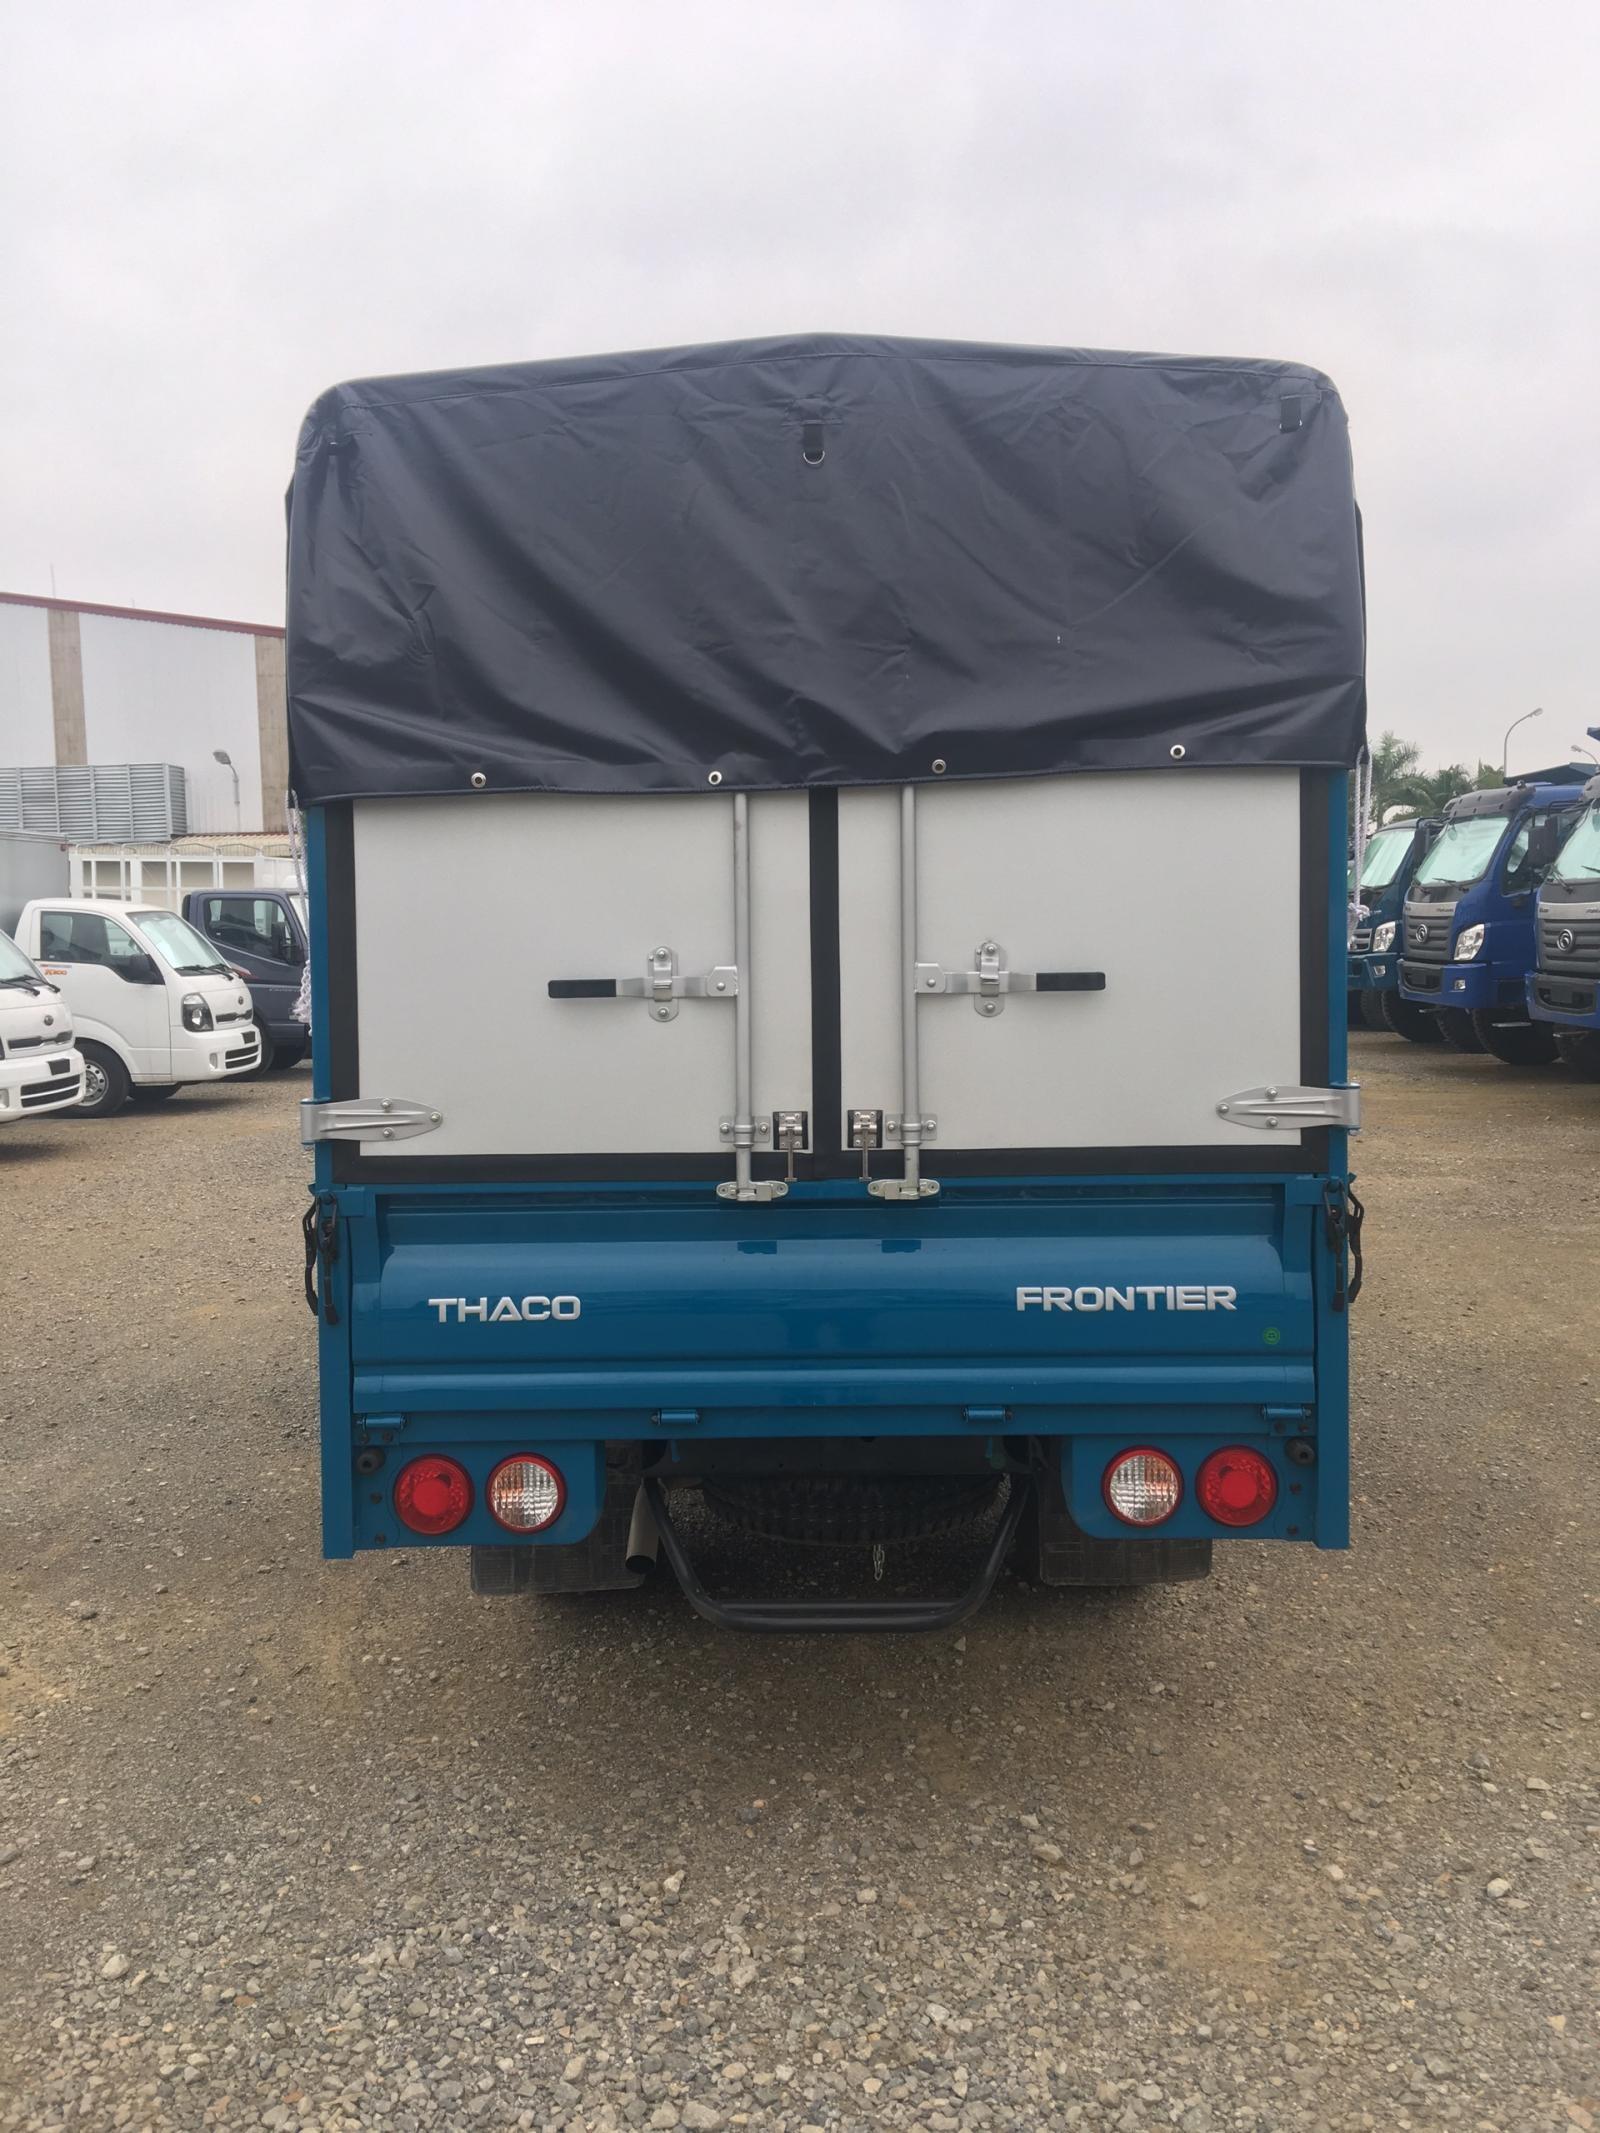 Bán xe tải 1.4 tấn 2020 Kia K250, LH 0349.345.111